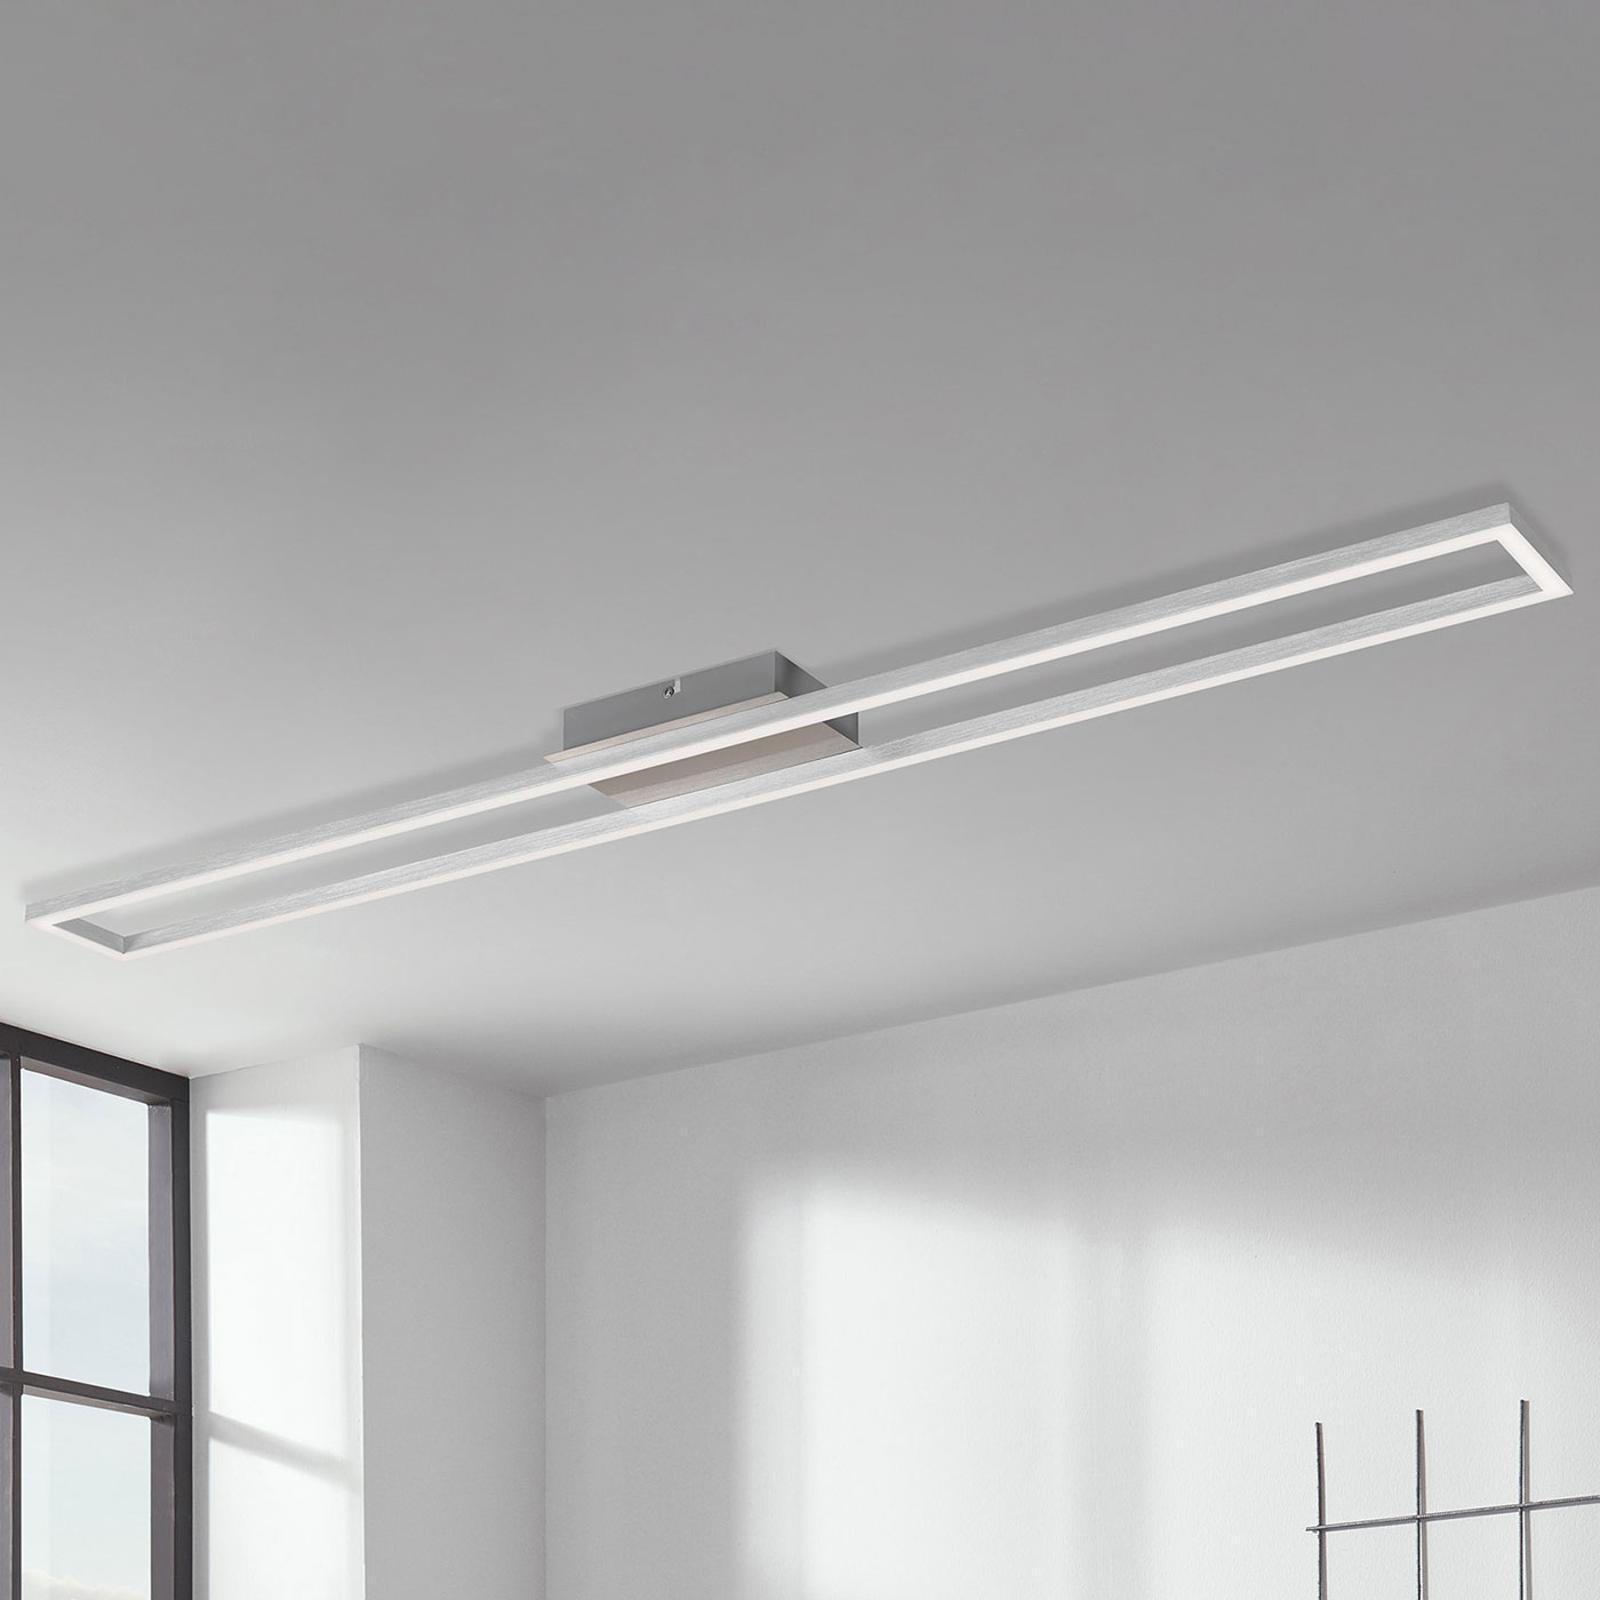 Lampa sufitowa Frame 3-stopnie, aluminium 110x12cm